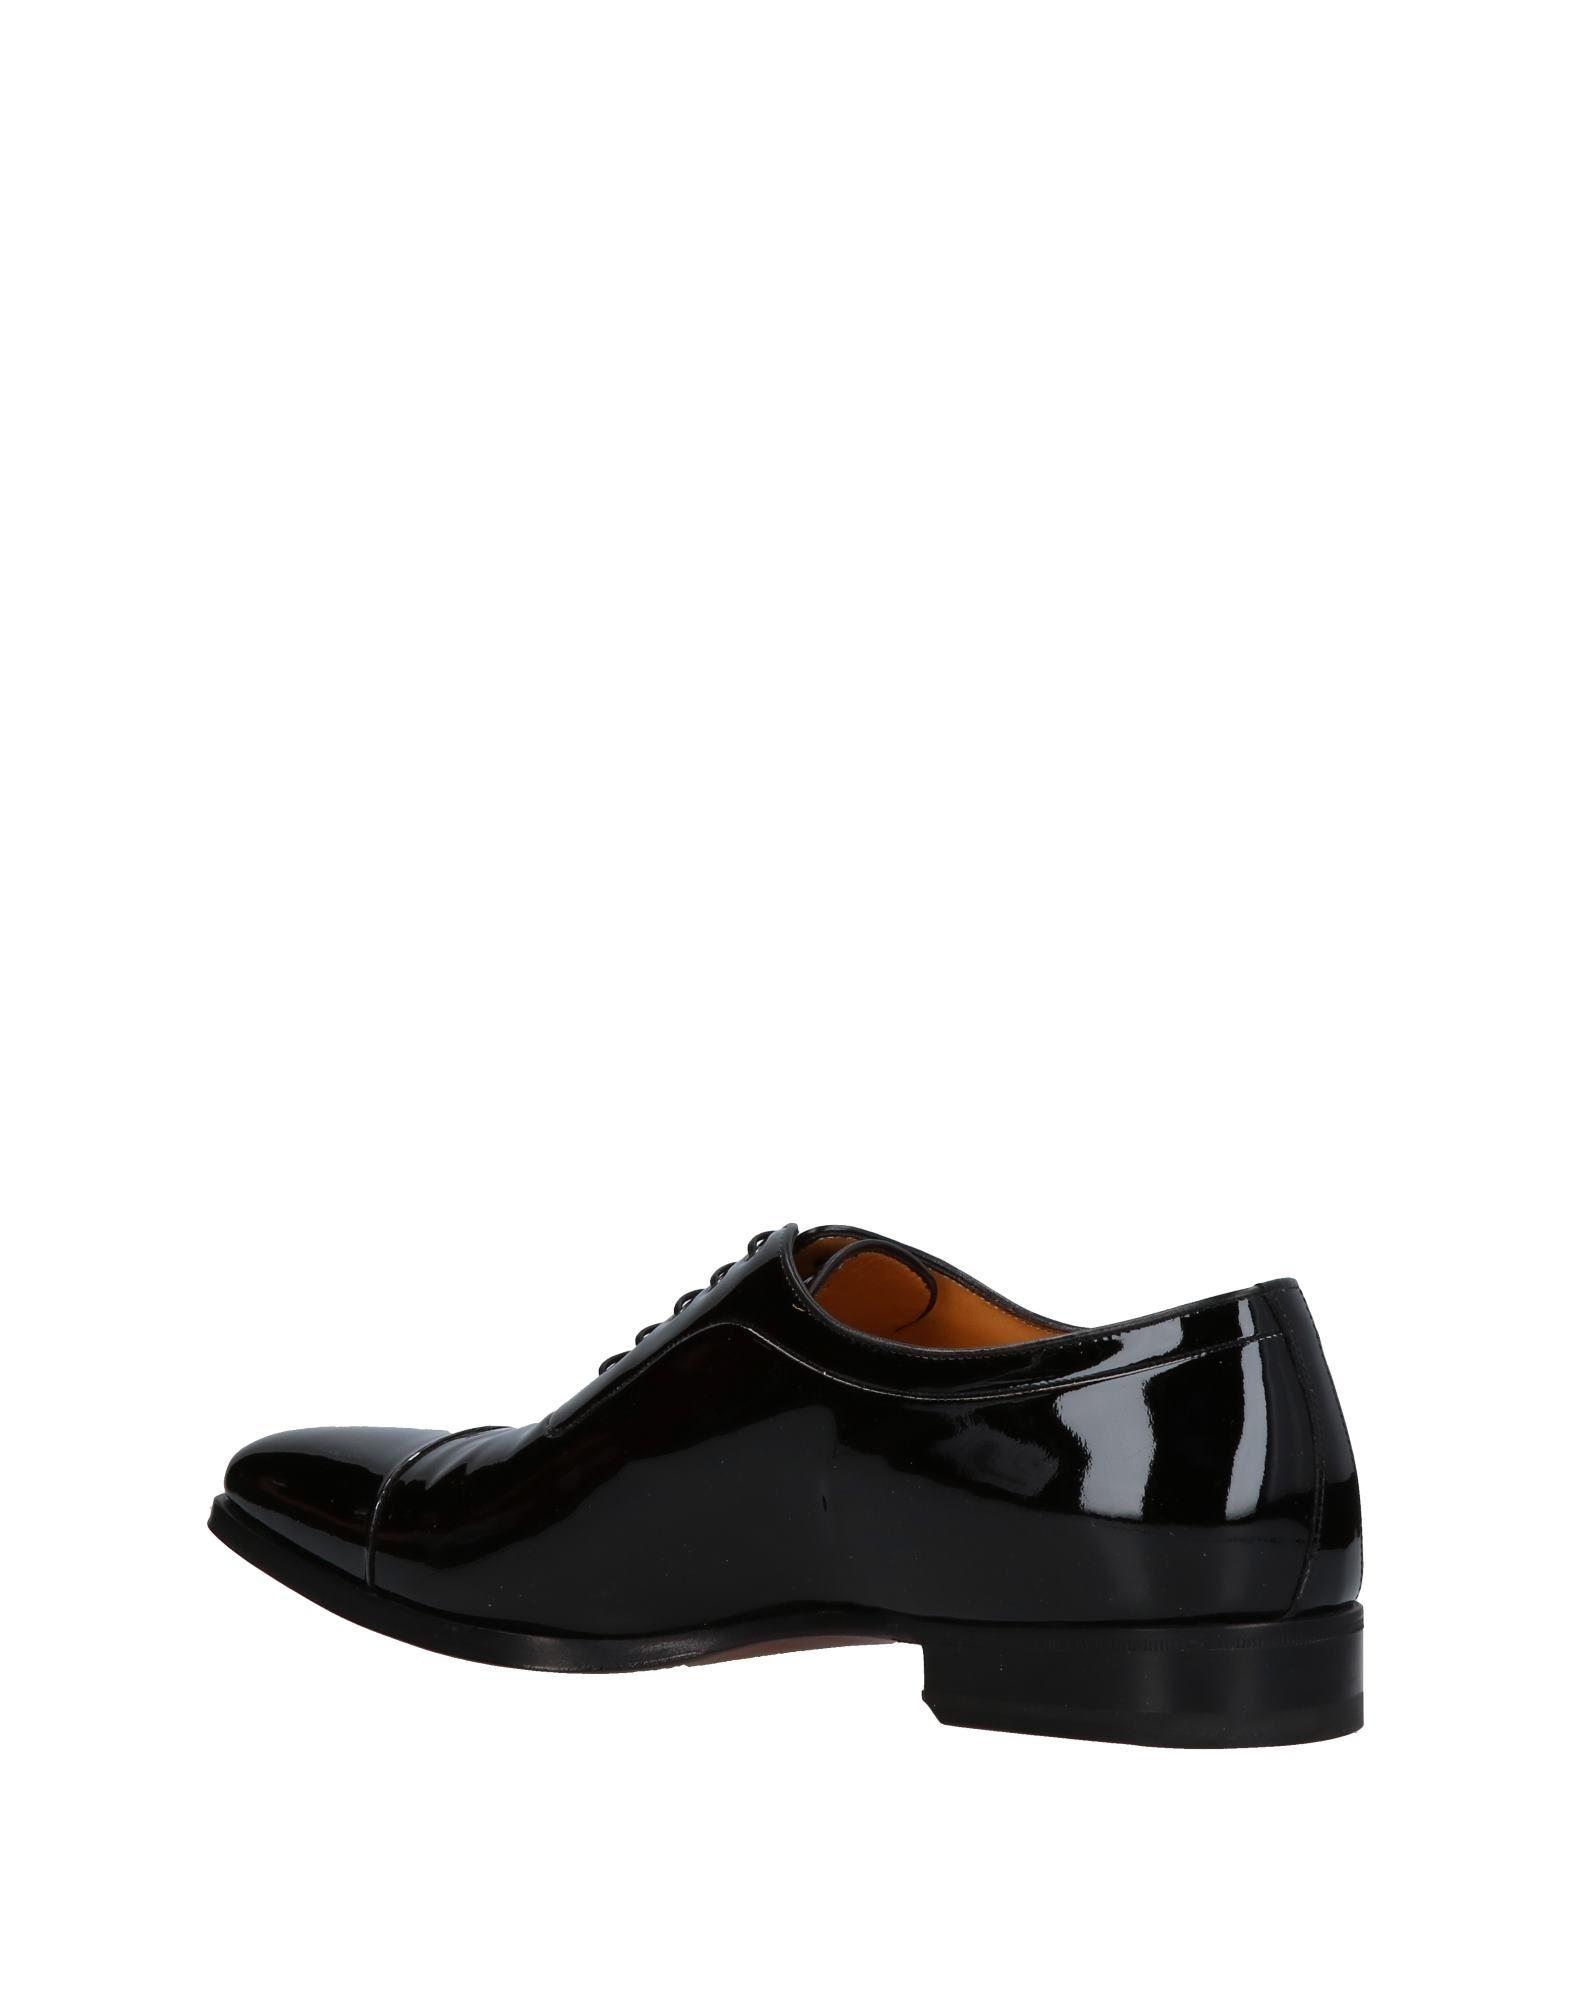 A.Testoni Schnürschuhe Schnürschuhe A.Testoni Herren  11353586PX Heiße Schuhe 1b9b4c